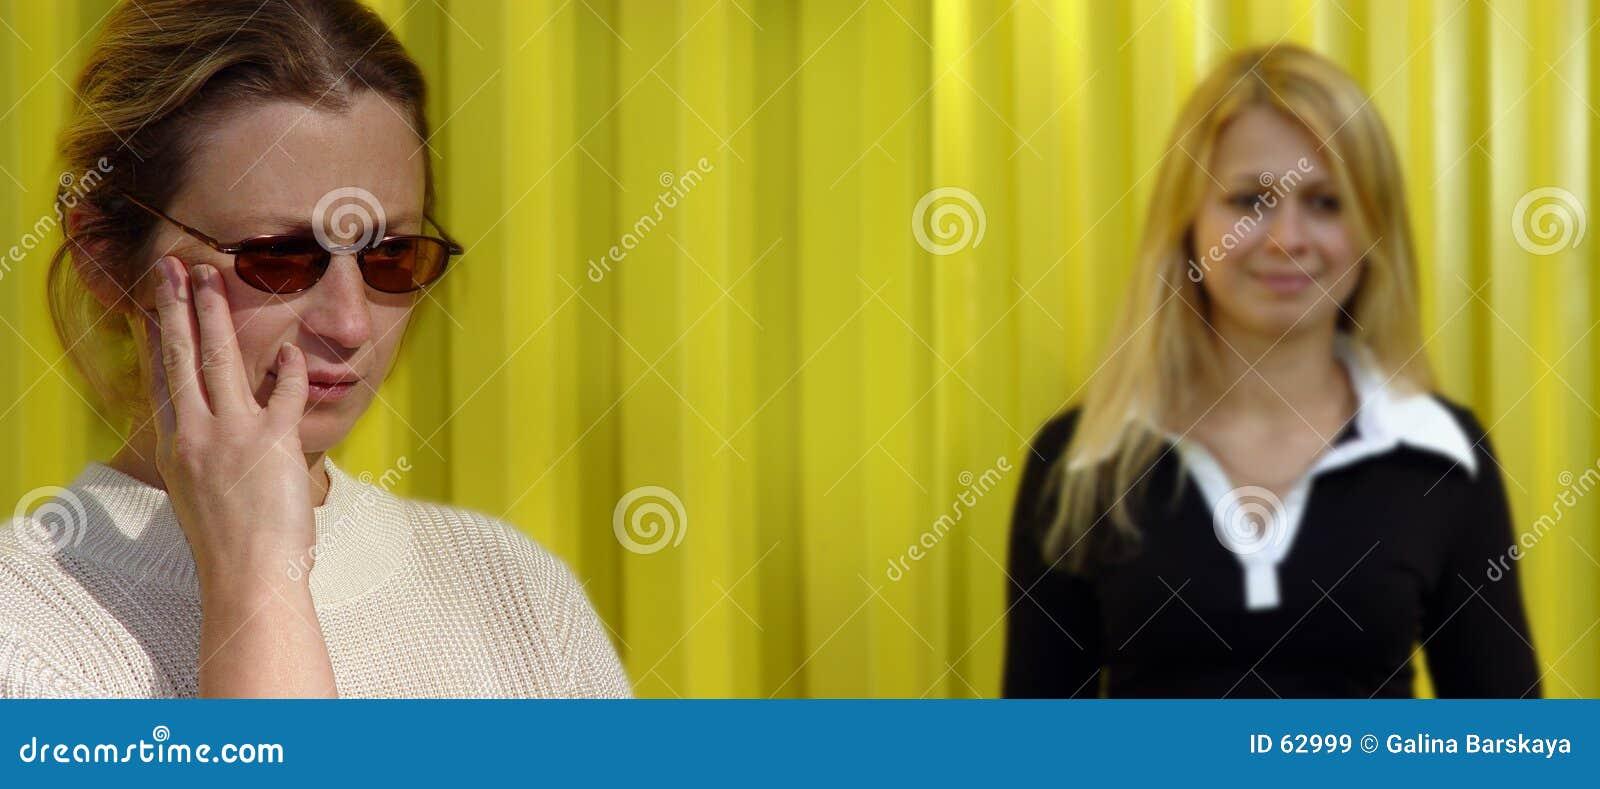 Blonde vrouwen op geel